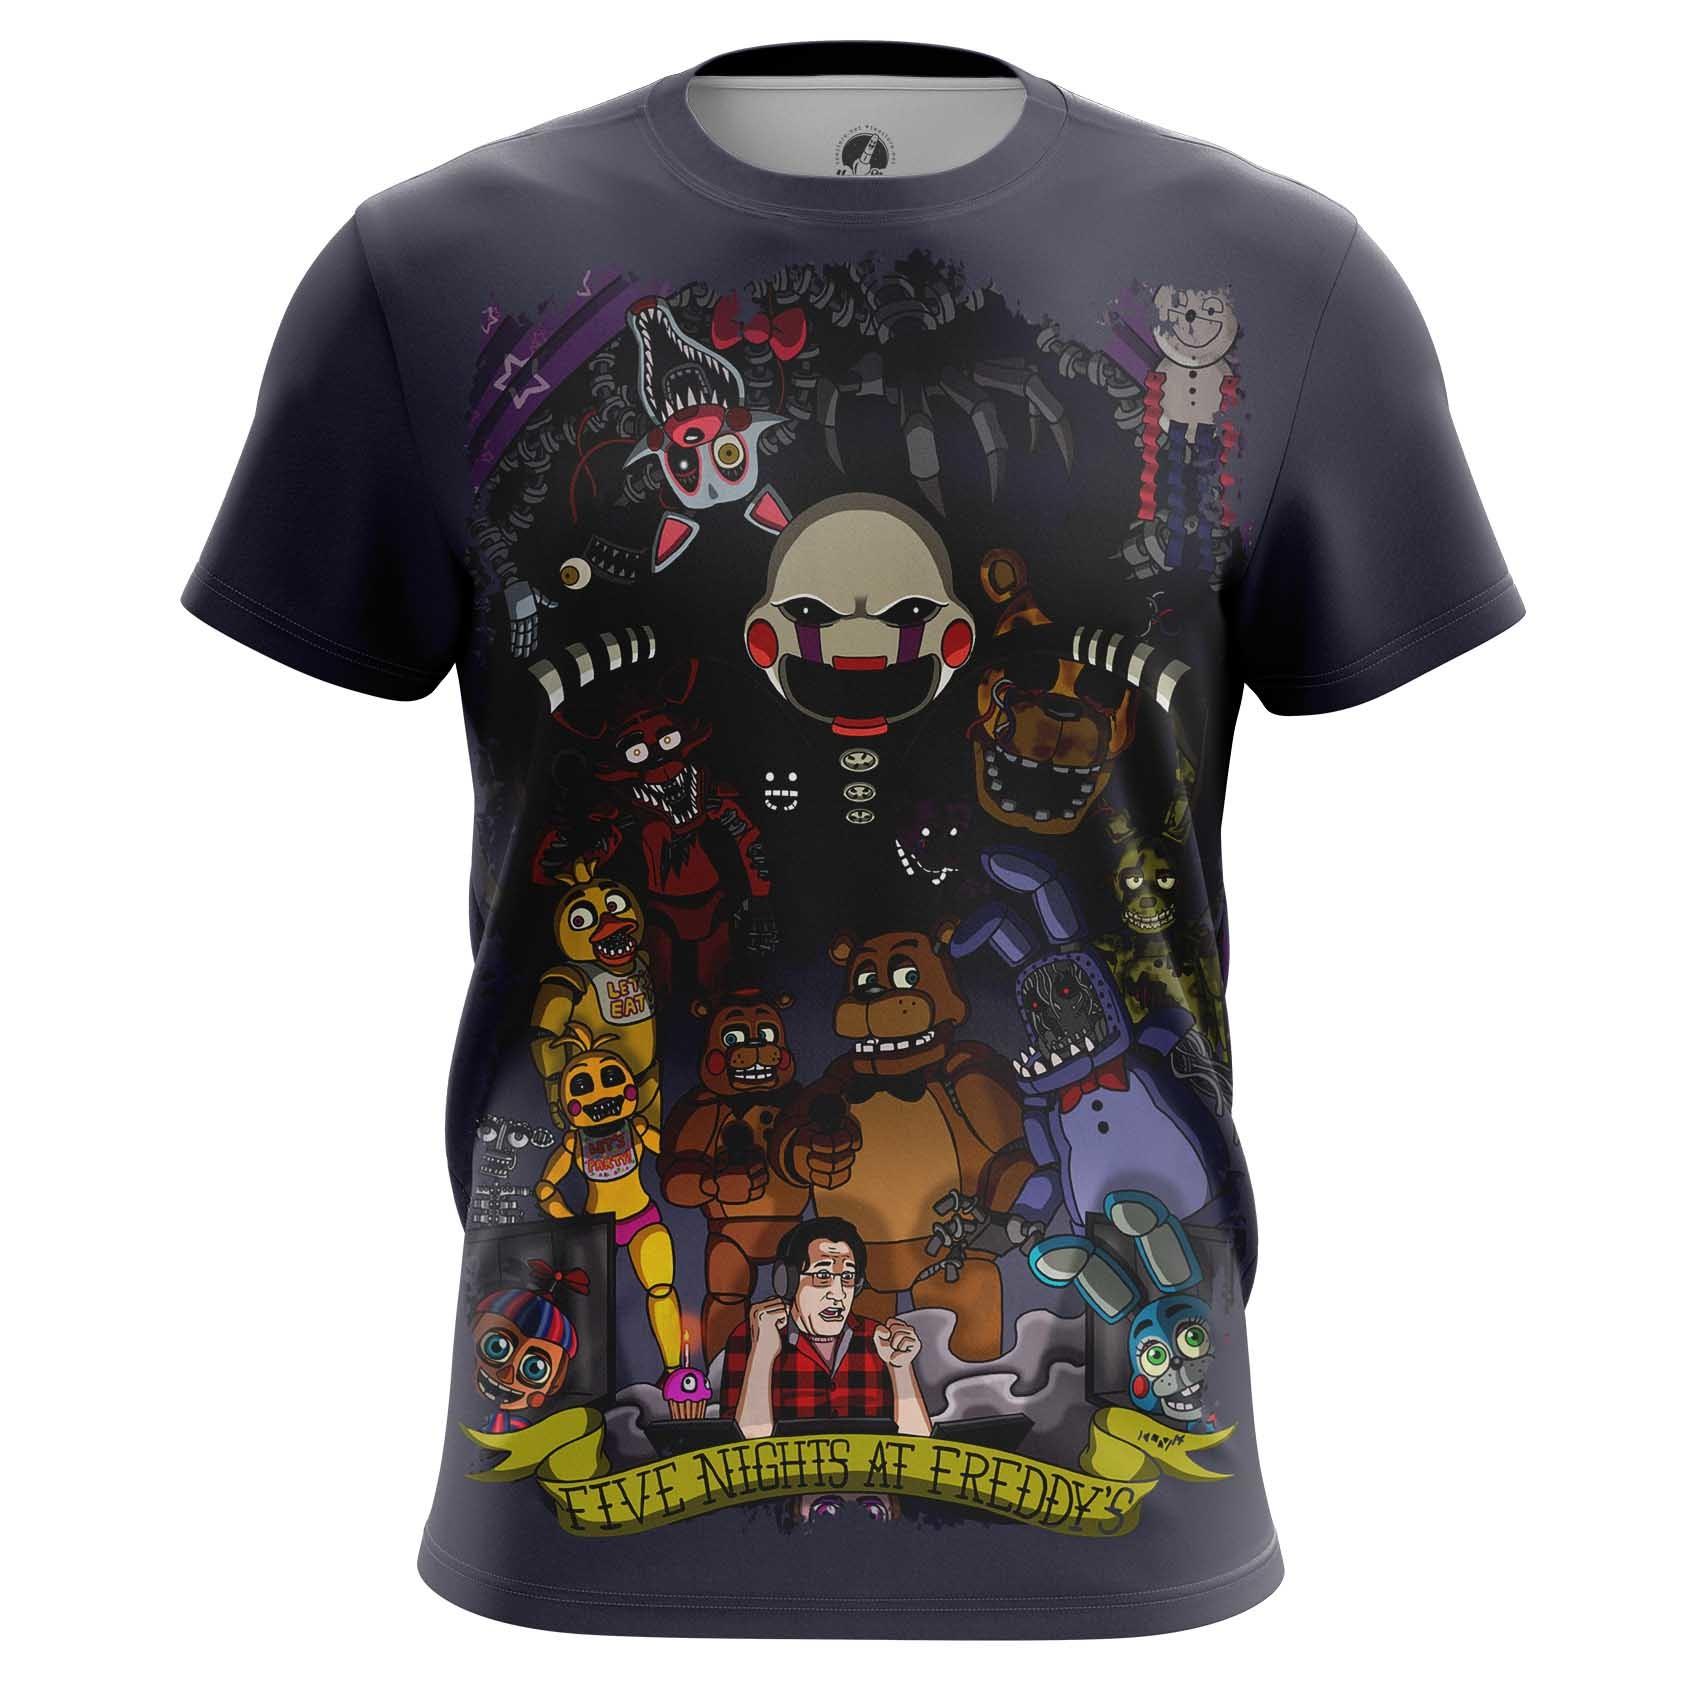 Merchandise Men'S T-Shirt 5 Nights At Freddy'S